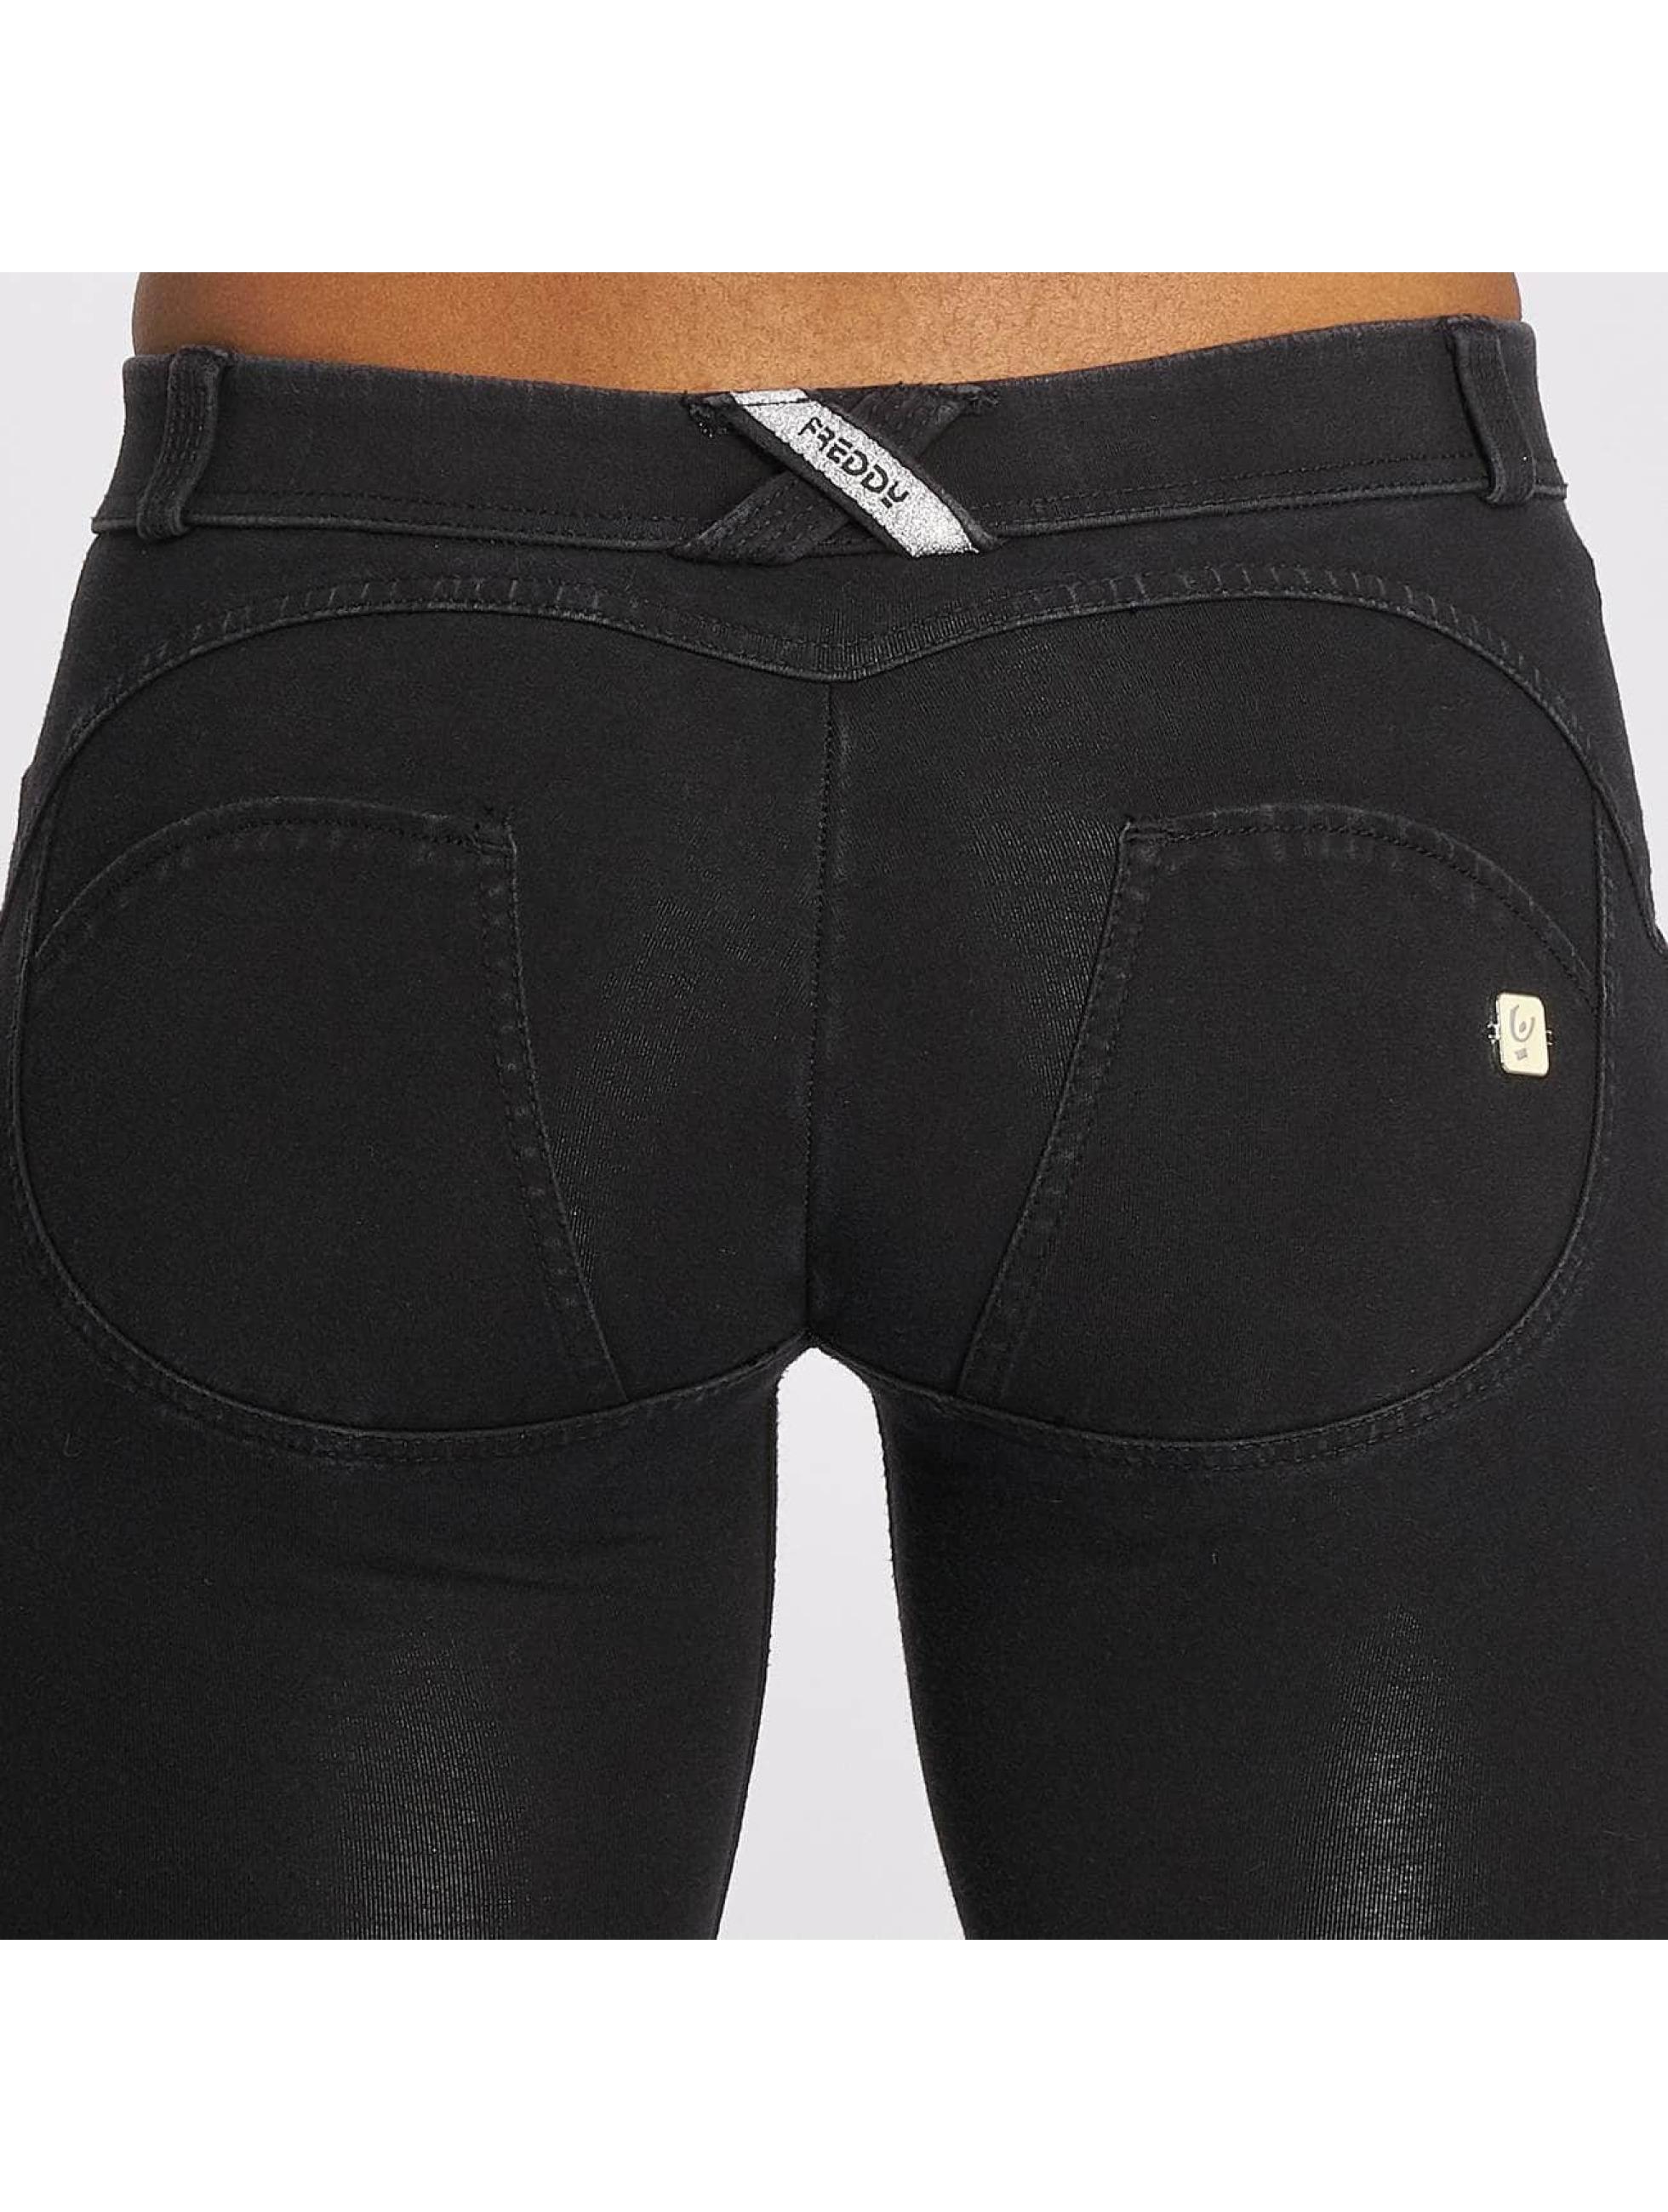 Freddy Skinny Jeans Laura black